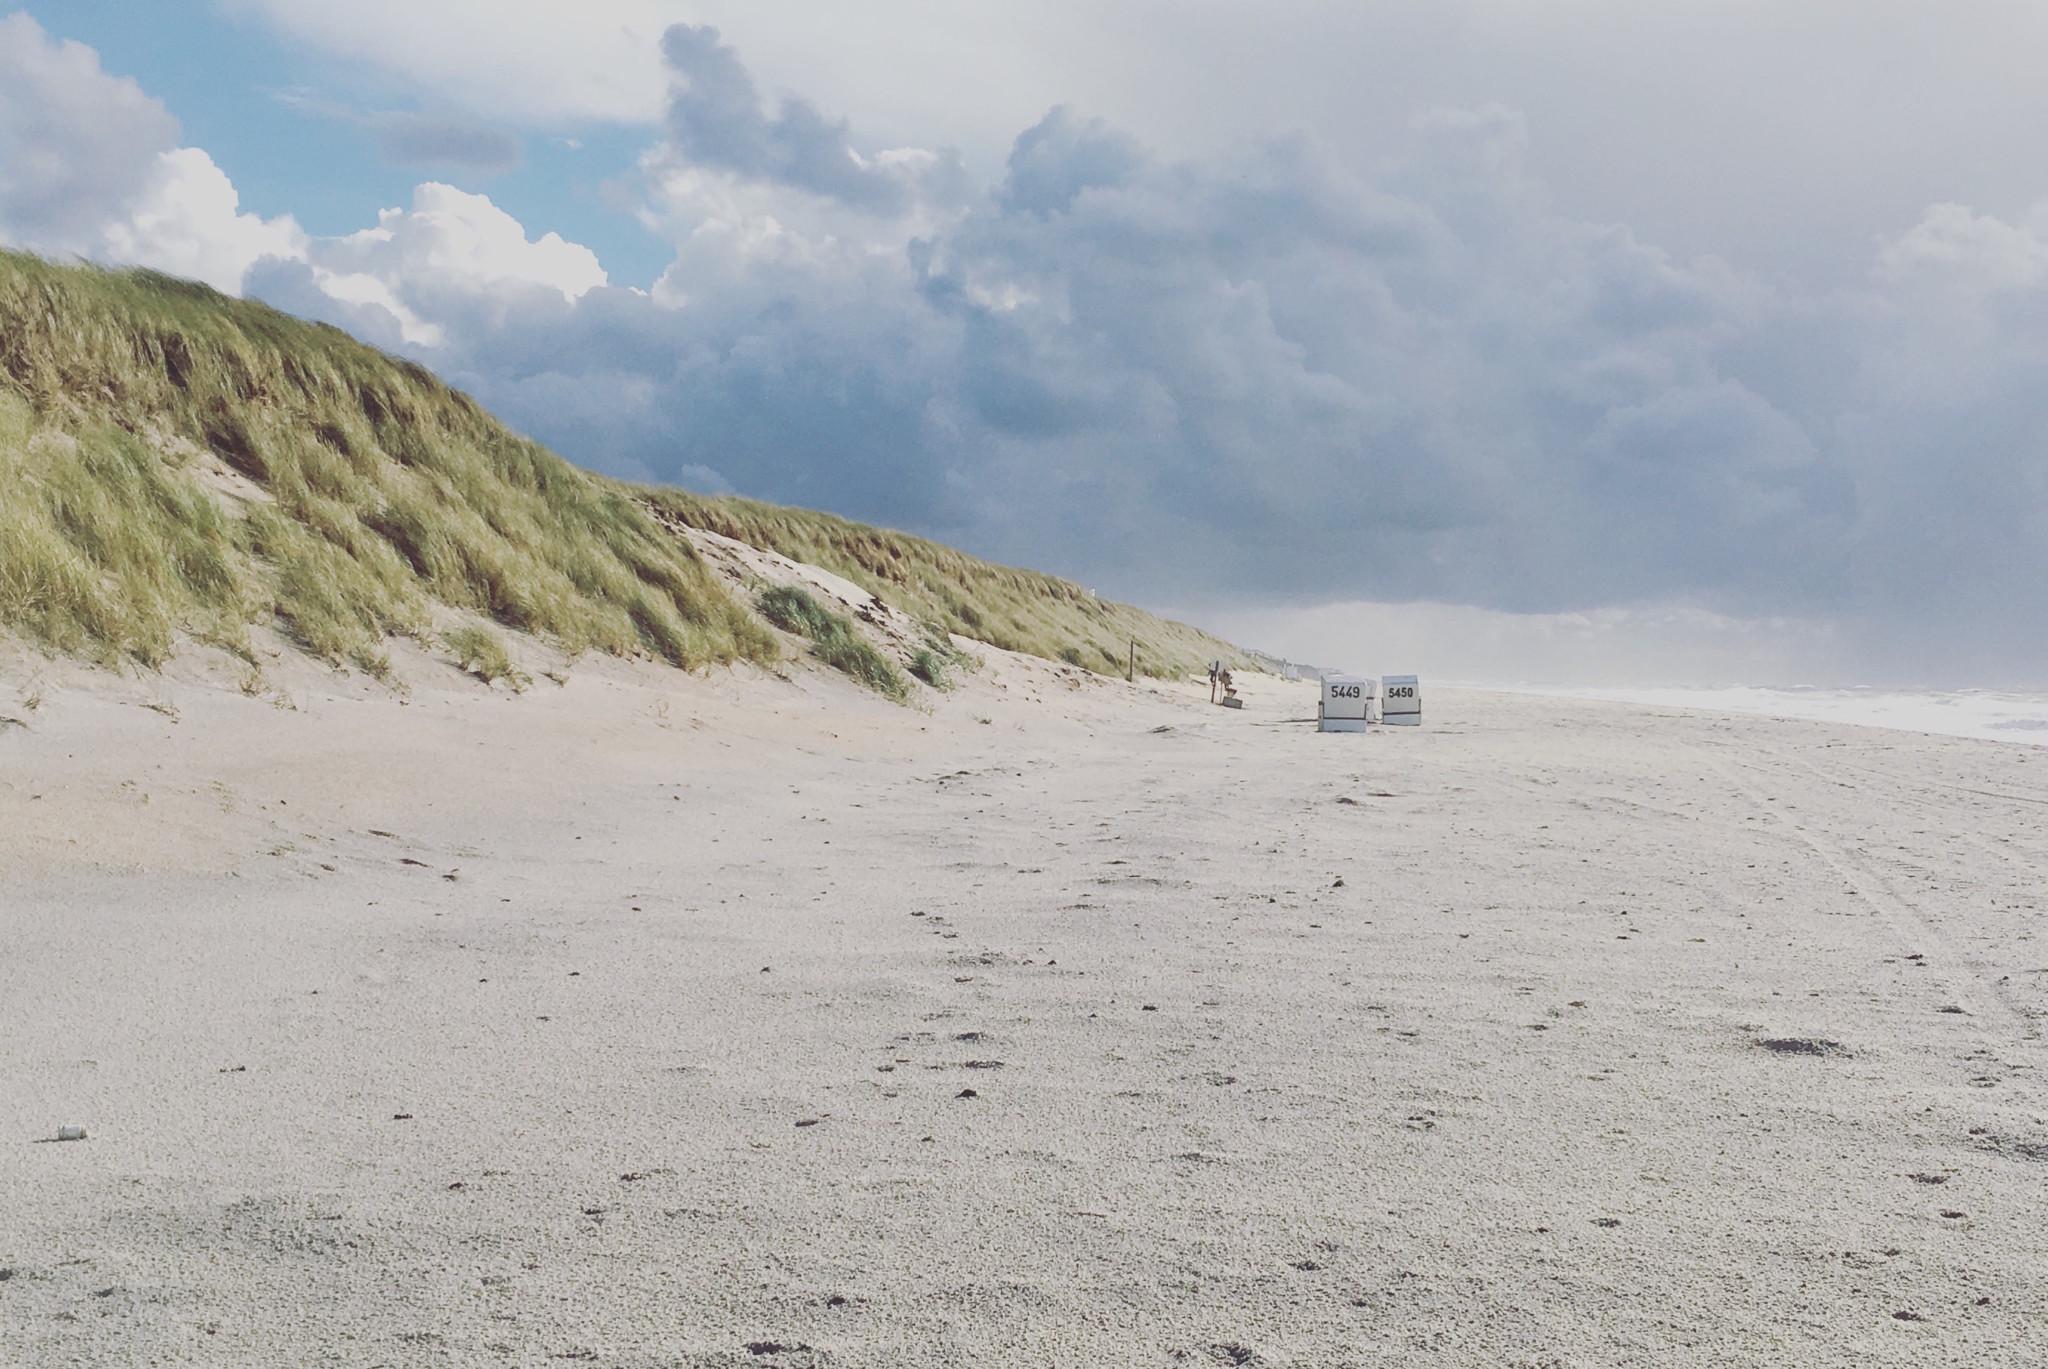 Urlaub mit Hund auf Sylt Tipps Restauarant Hotel Strand 4